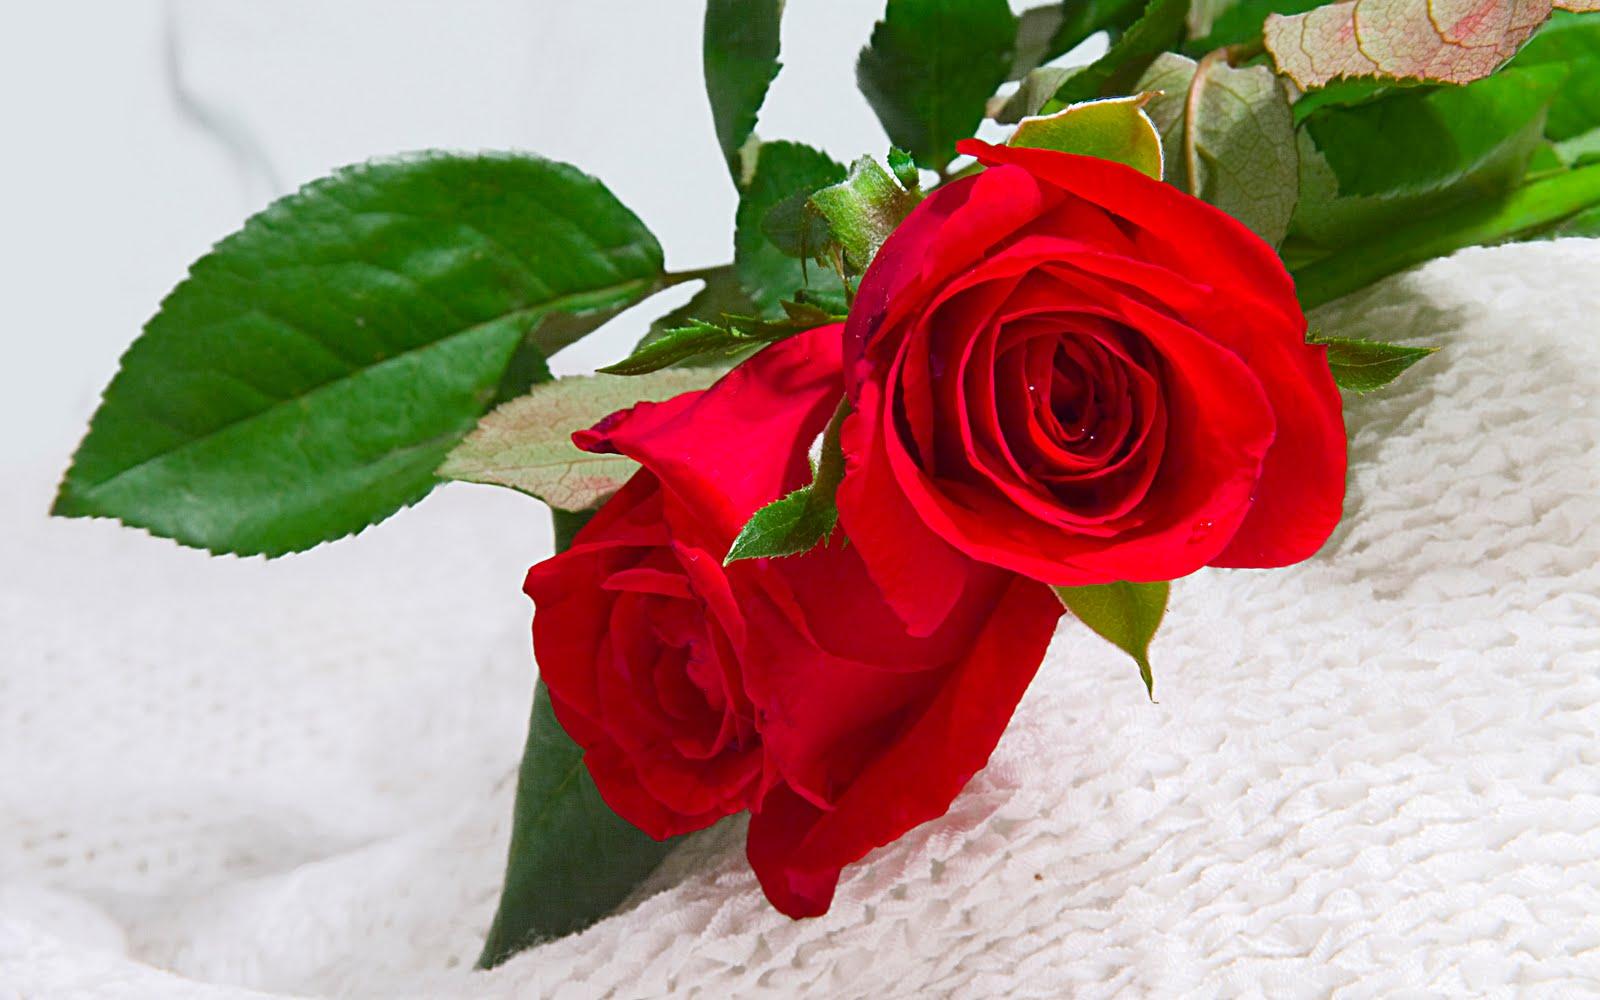 http://1.bp.blogspot.com/-MdsF1Hm79Sk/Te4cH3UK2eI/AAAAAAAAGdc/OTS-NwUSqS4/s1600/red%20rose%20flowers%20wallpapers.jpg%20%283%29.jpg